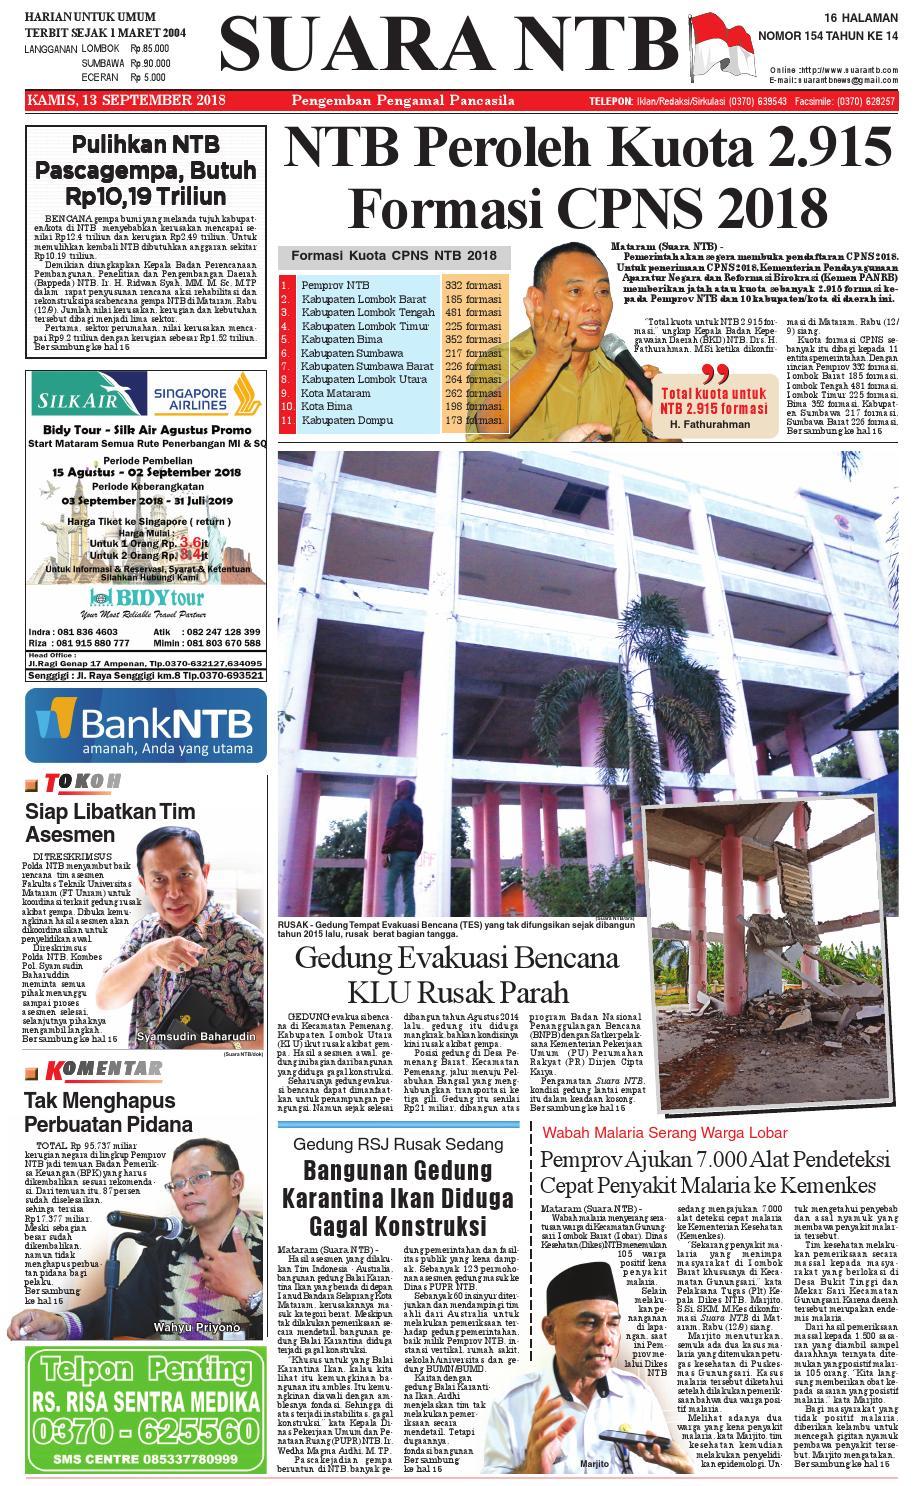 Edisi Kamis 13 September 2018 Suara Ntb By E Paper Kmb Issuu Produk Ukm Bumn Sambal Bawang Goreng Maklin